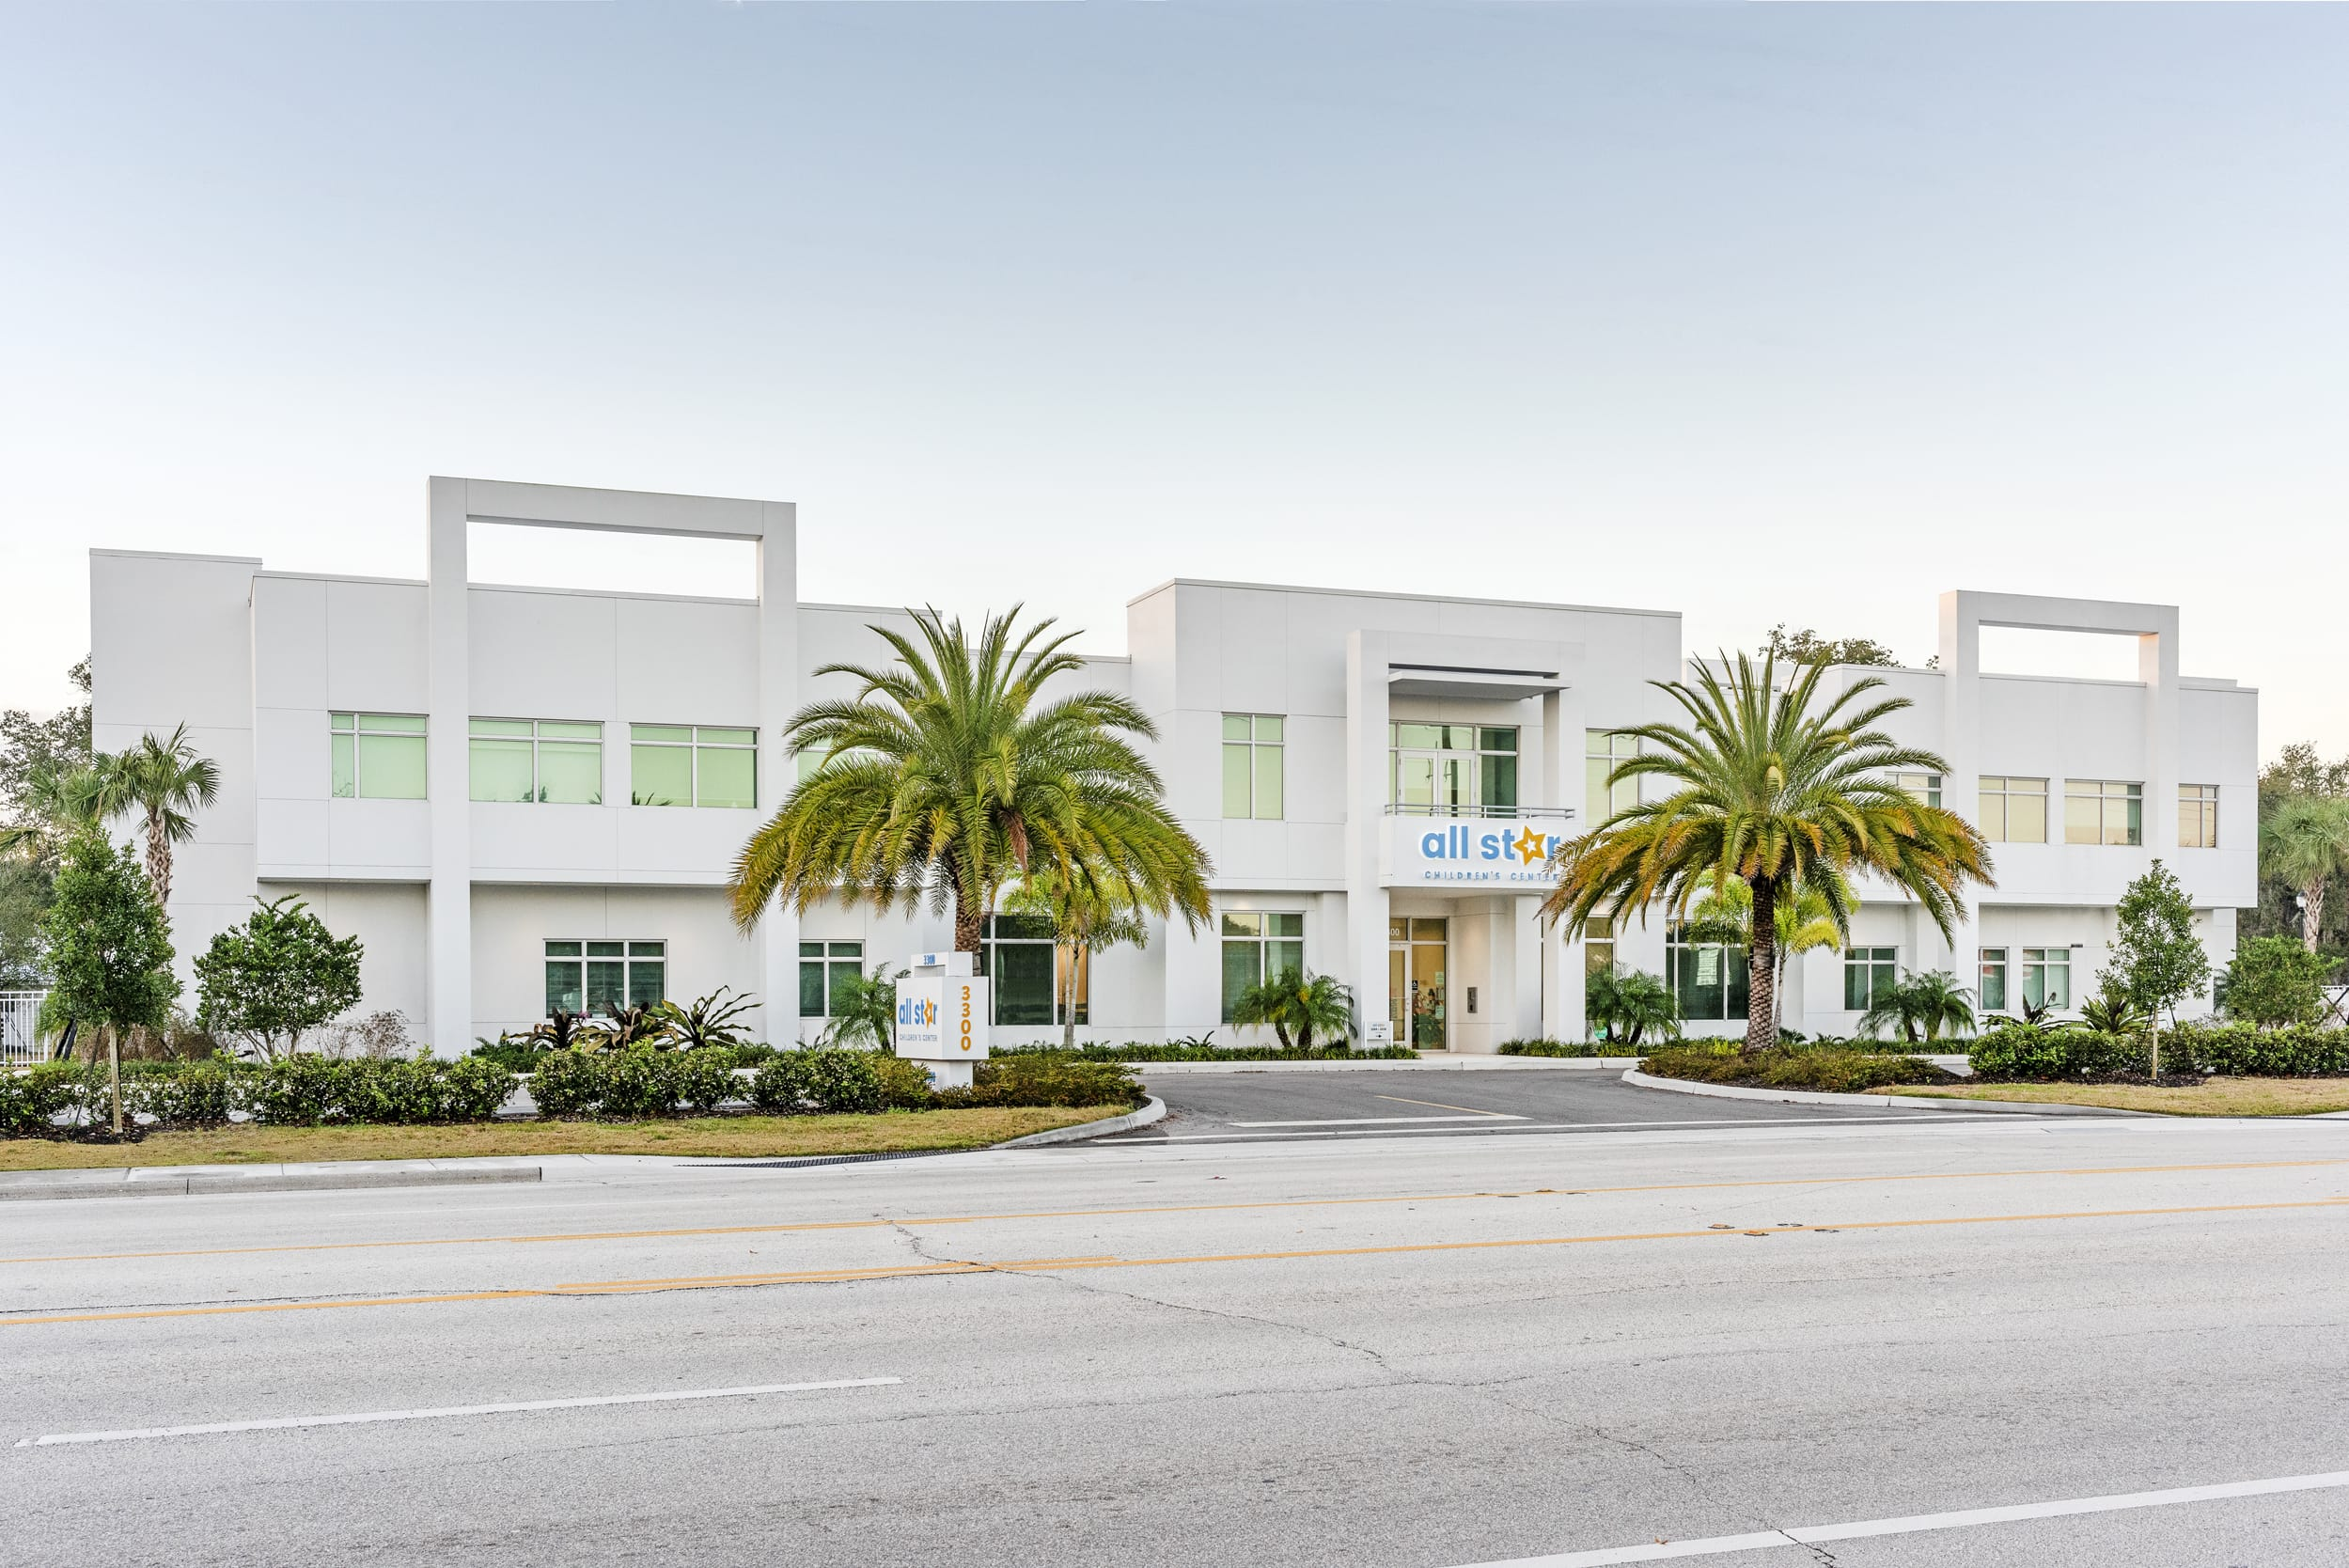 All Star Children's Center Full Exterior Palm Trees White Contemporary